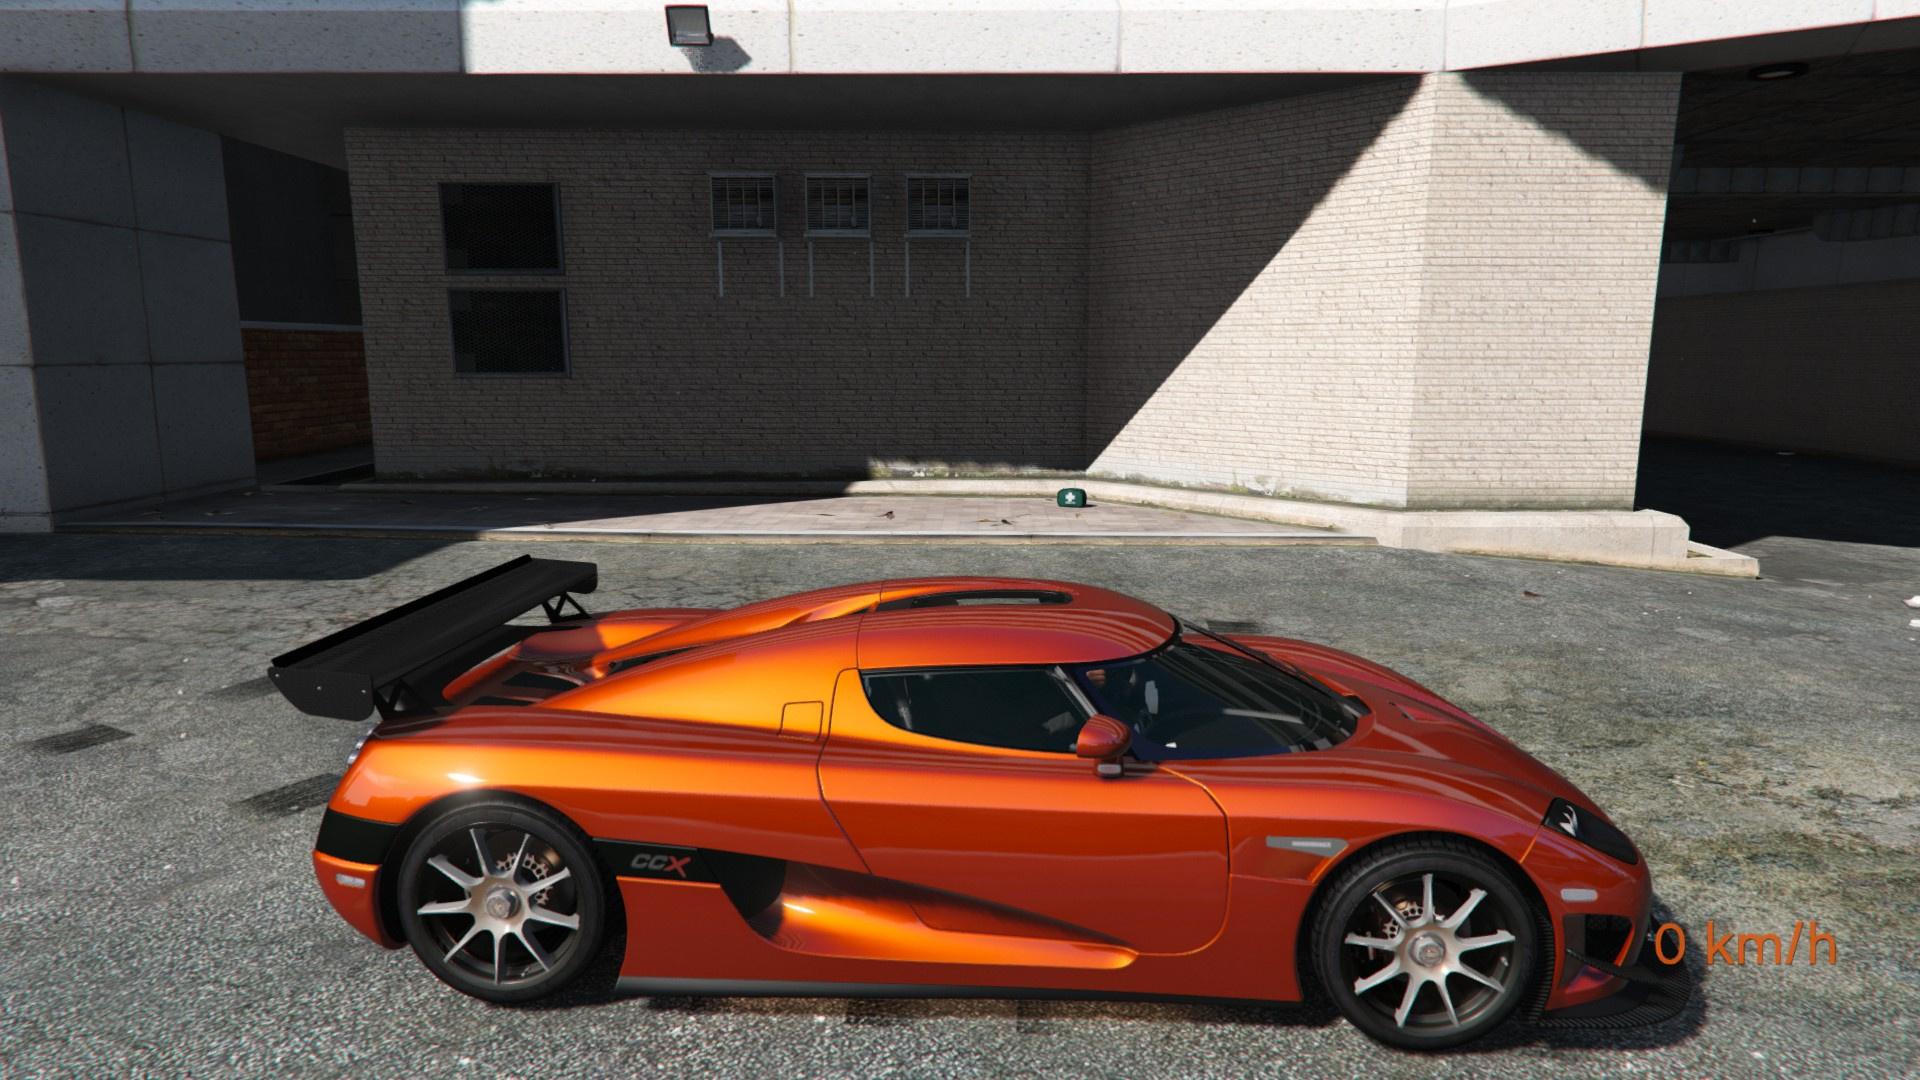 Dde Gta on 2006 Cadillac Cts Extras